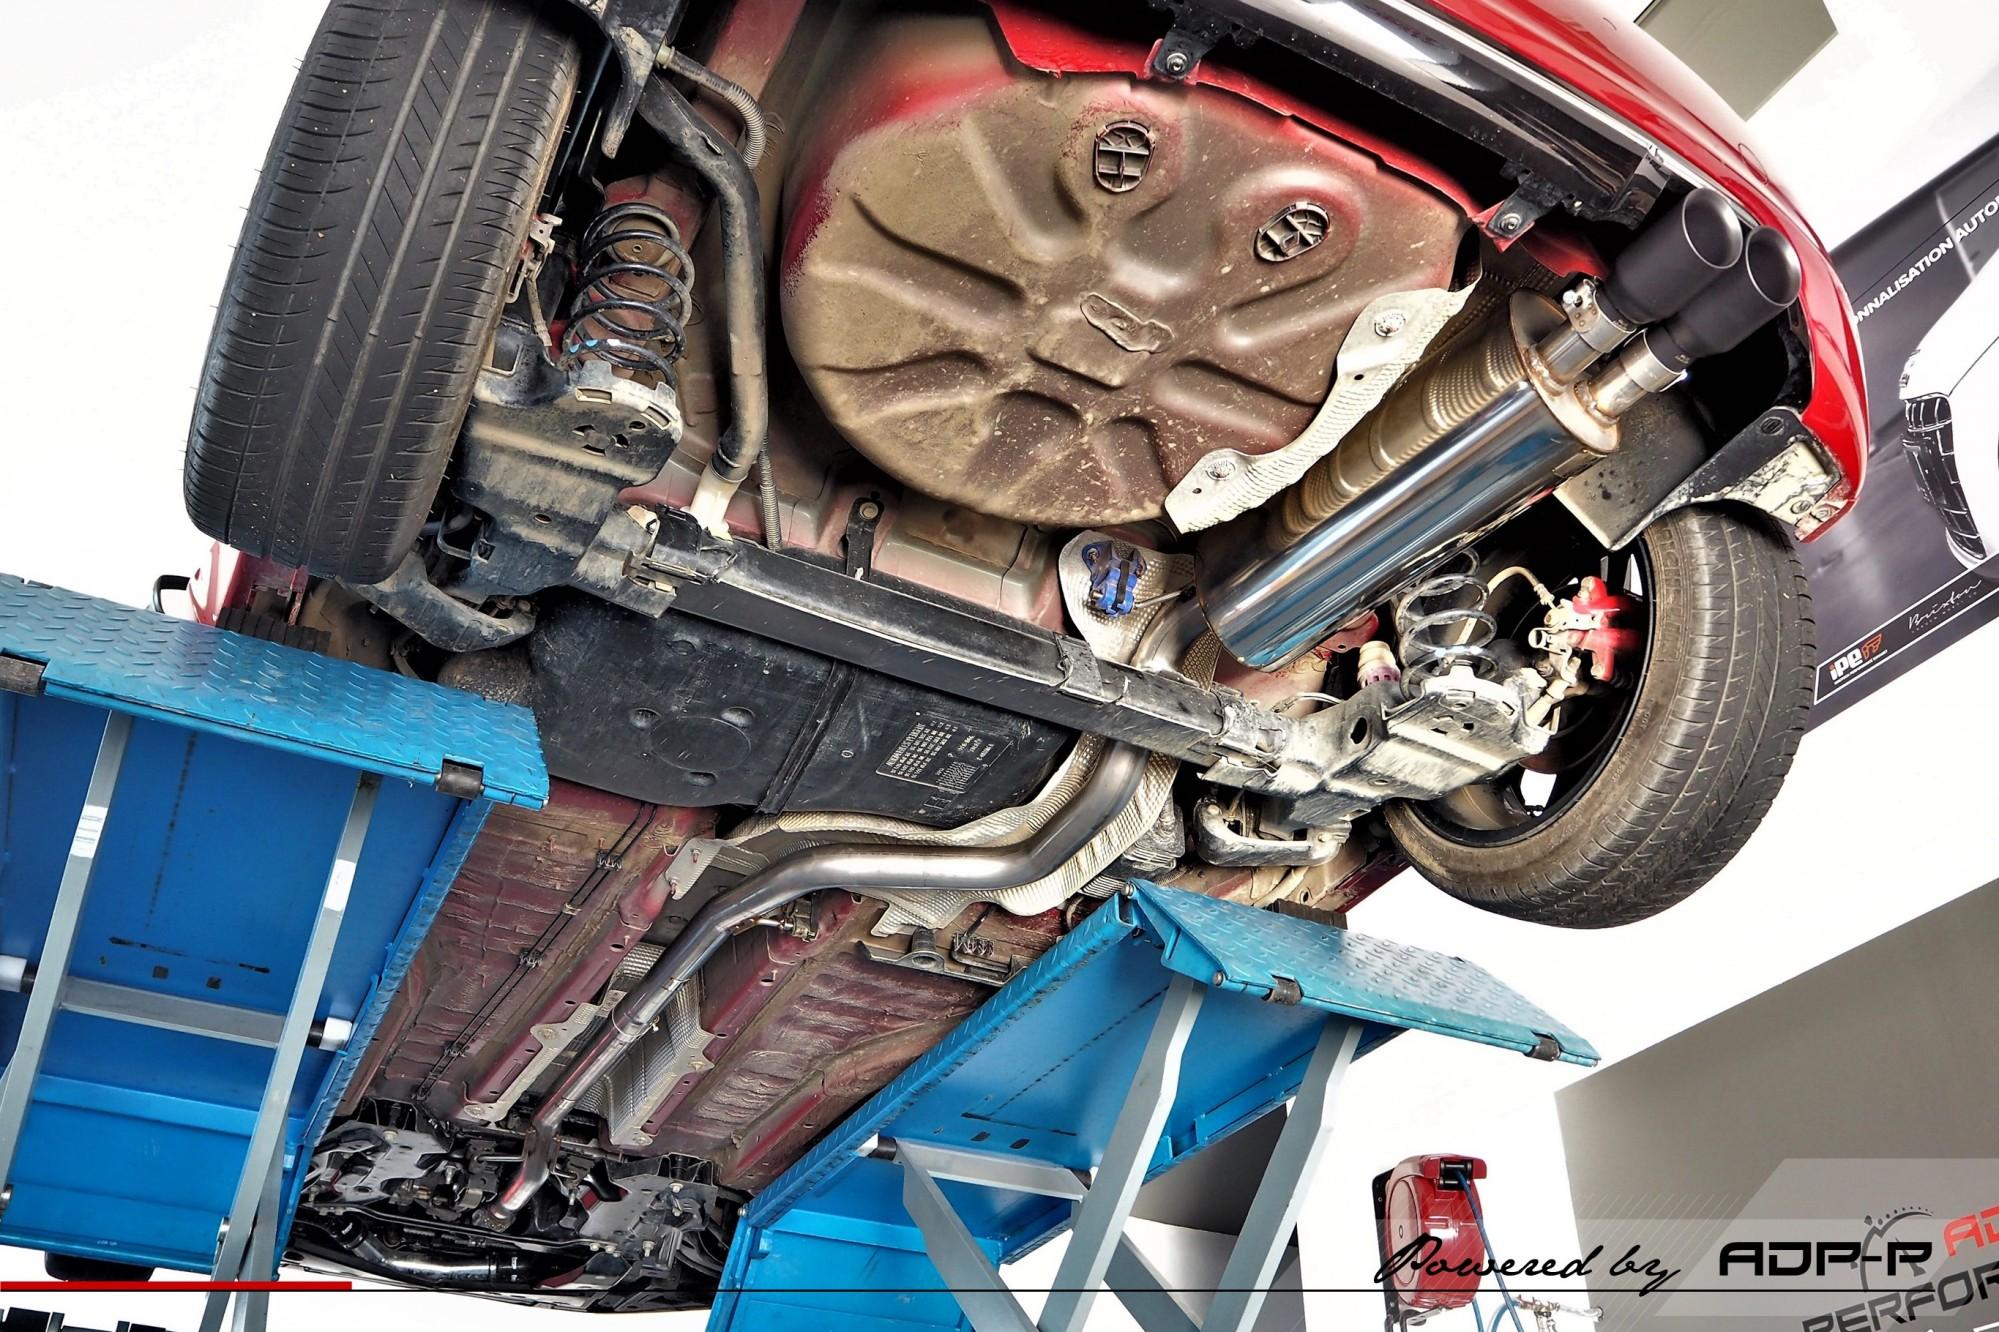 Ligne complète Milltek Avignon - Peugeot 208 GTI 1.6 THP 200cv - ADP Performance